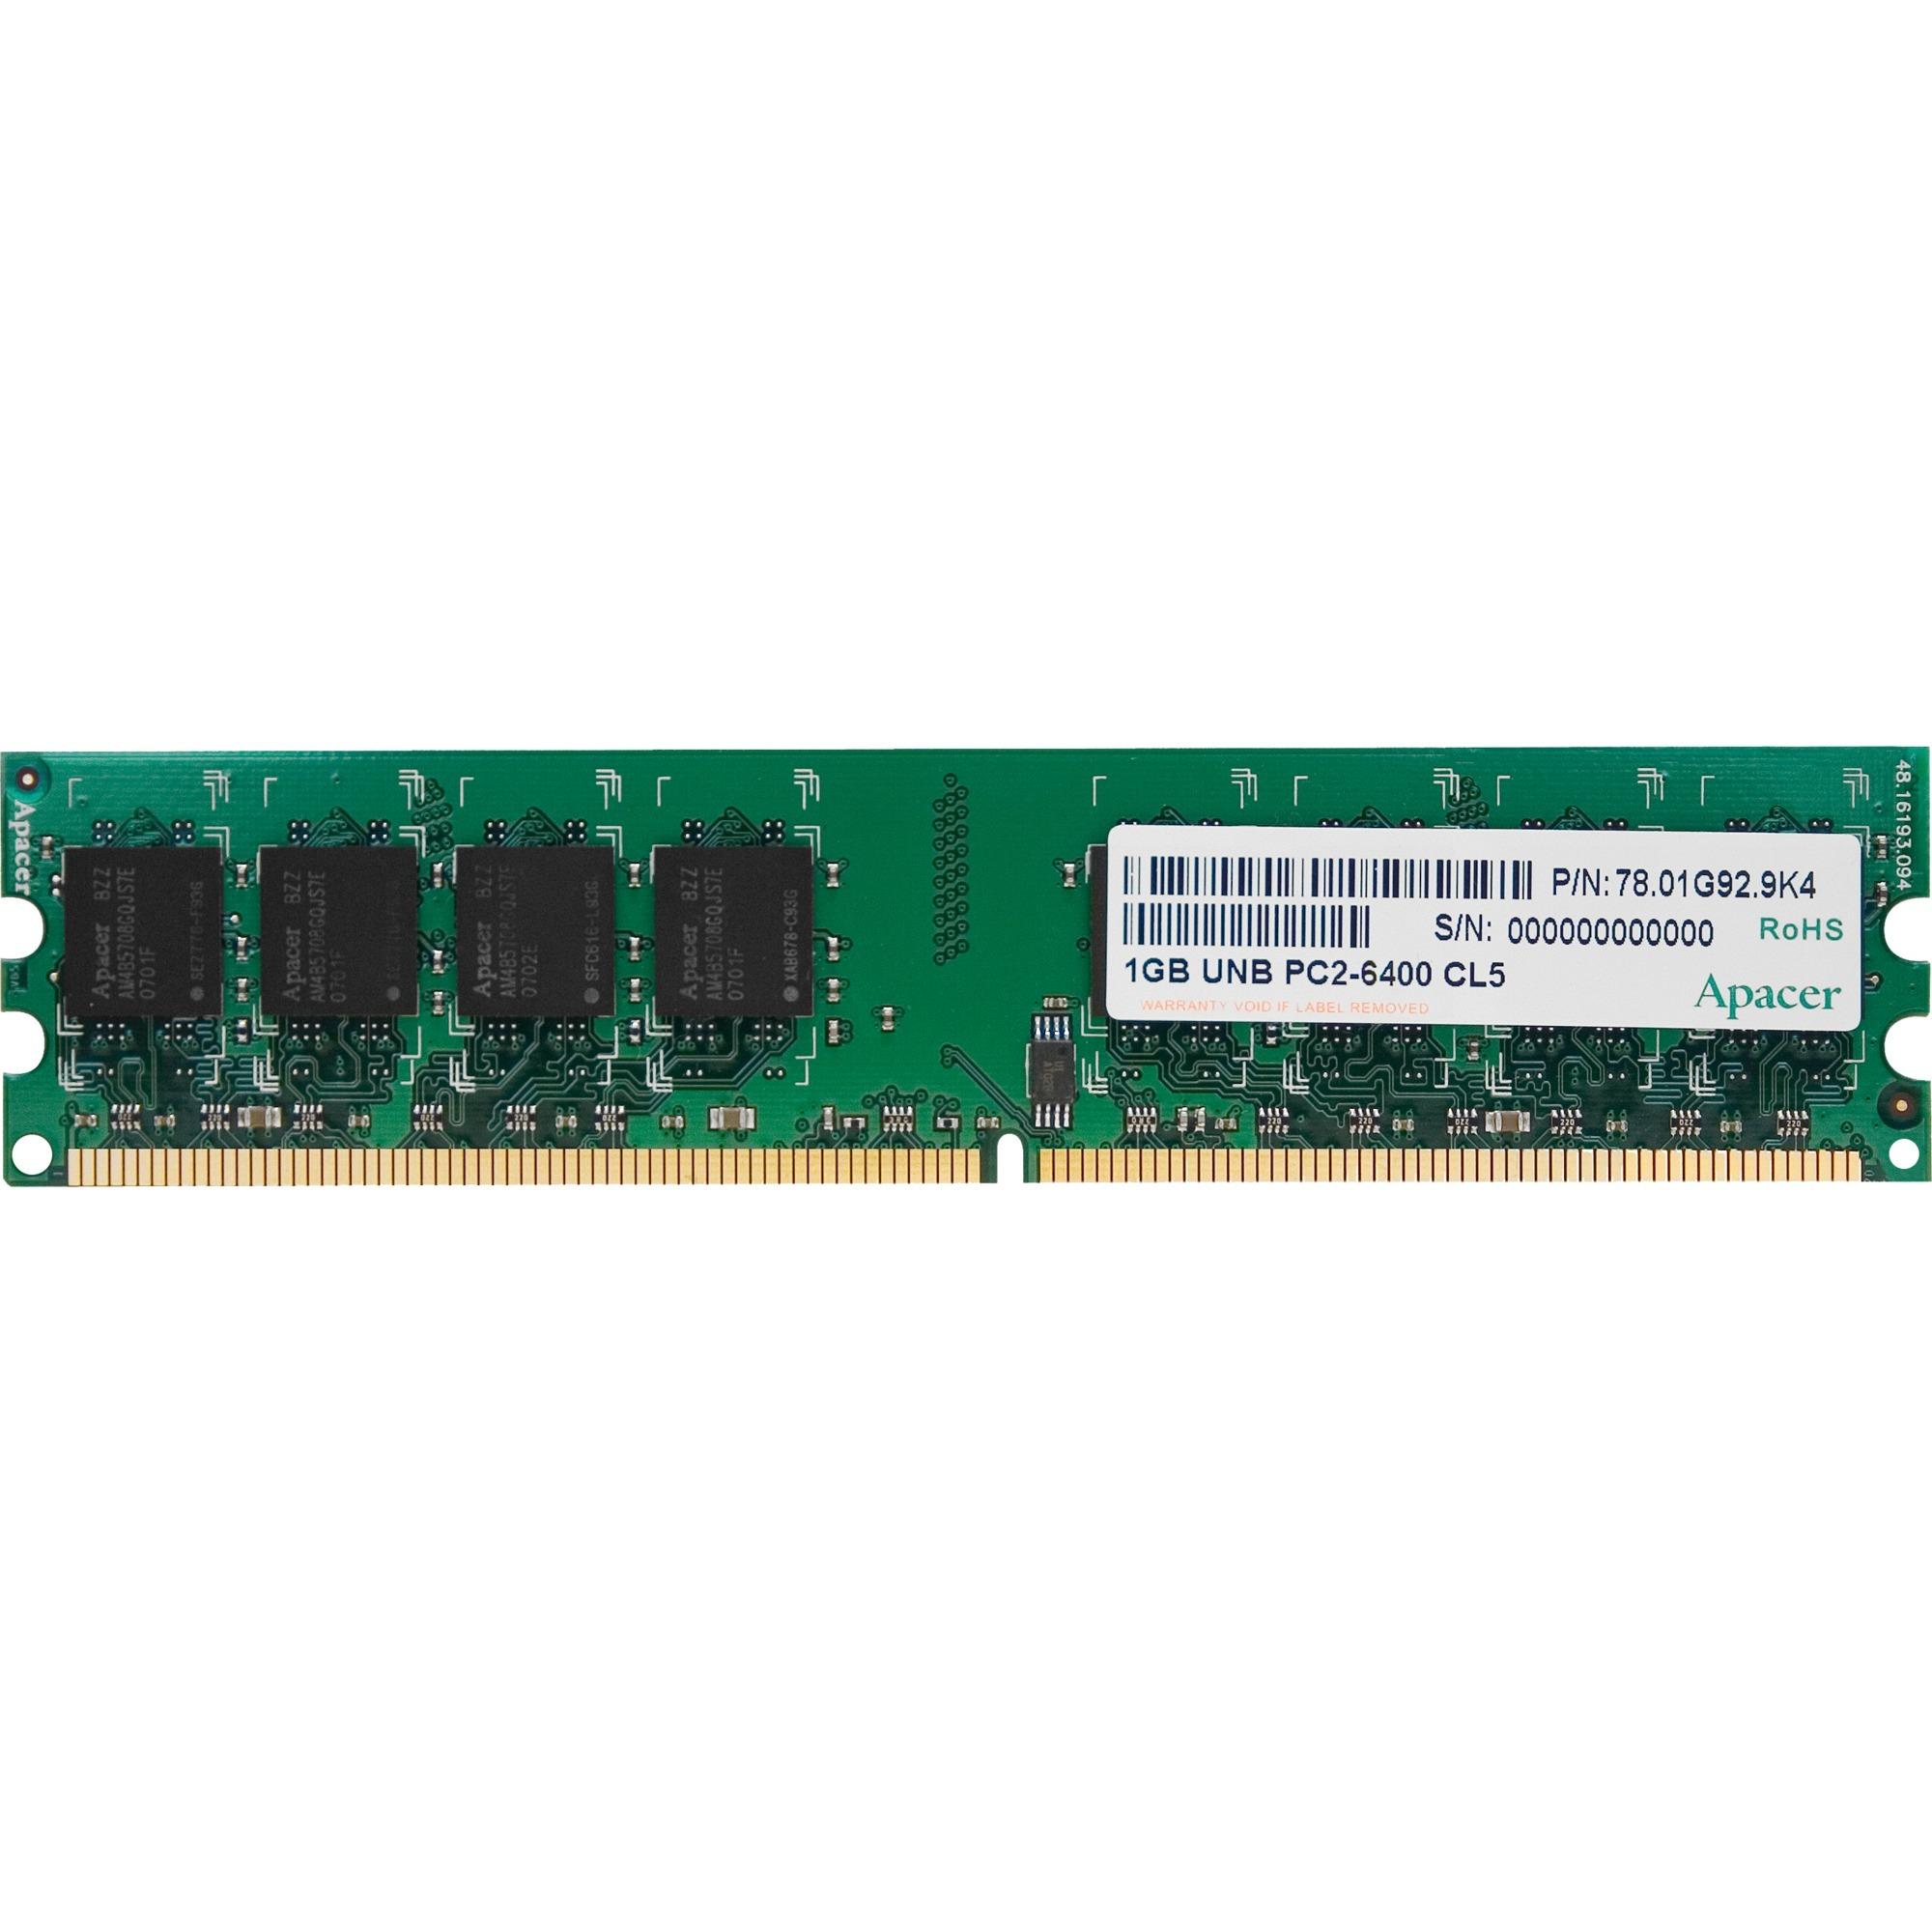 1GB DDR2 DIMM 1GB DDR2 800MHz módulo de memoria, Memoria RAM